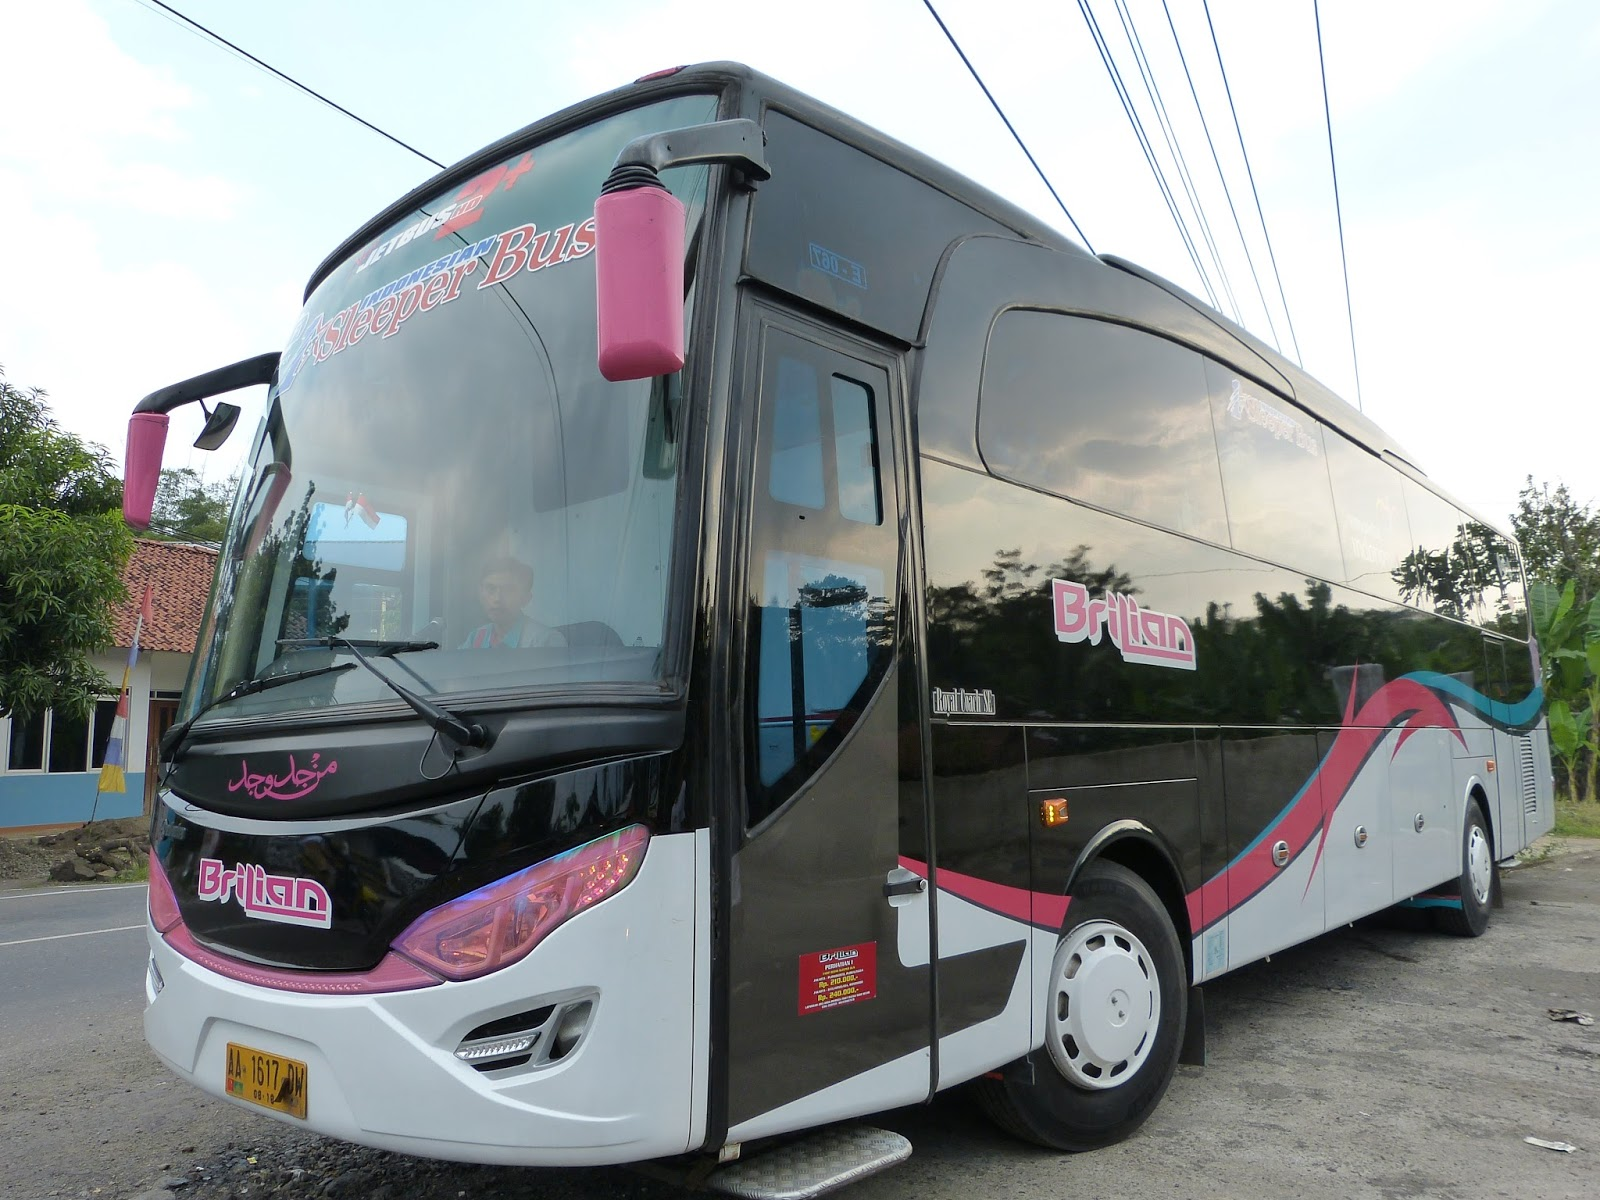 PO Brilian - Ini 5 Daftar Bus Premium yang Wira-Wiri di Indonesia